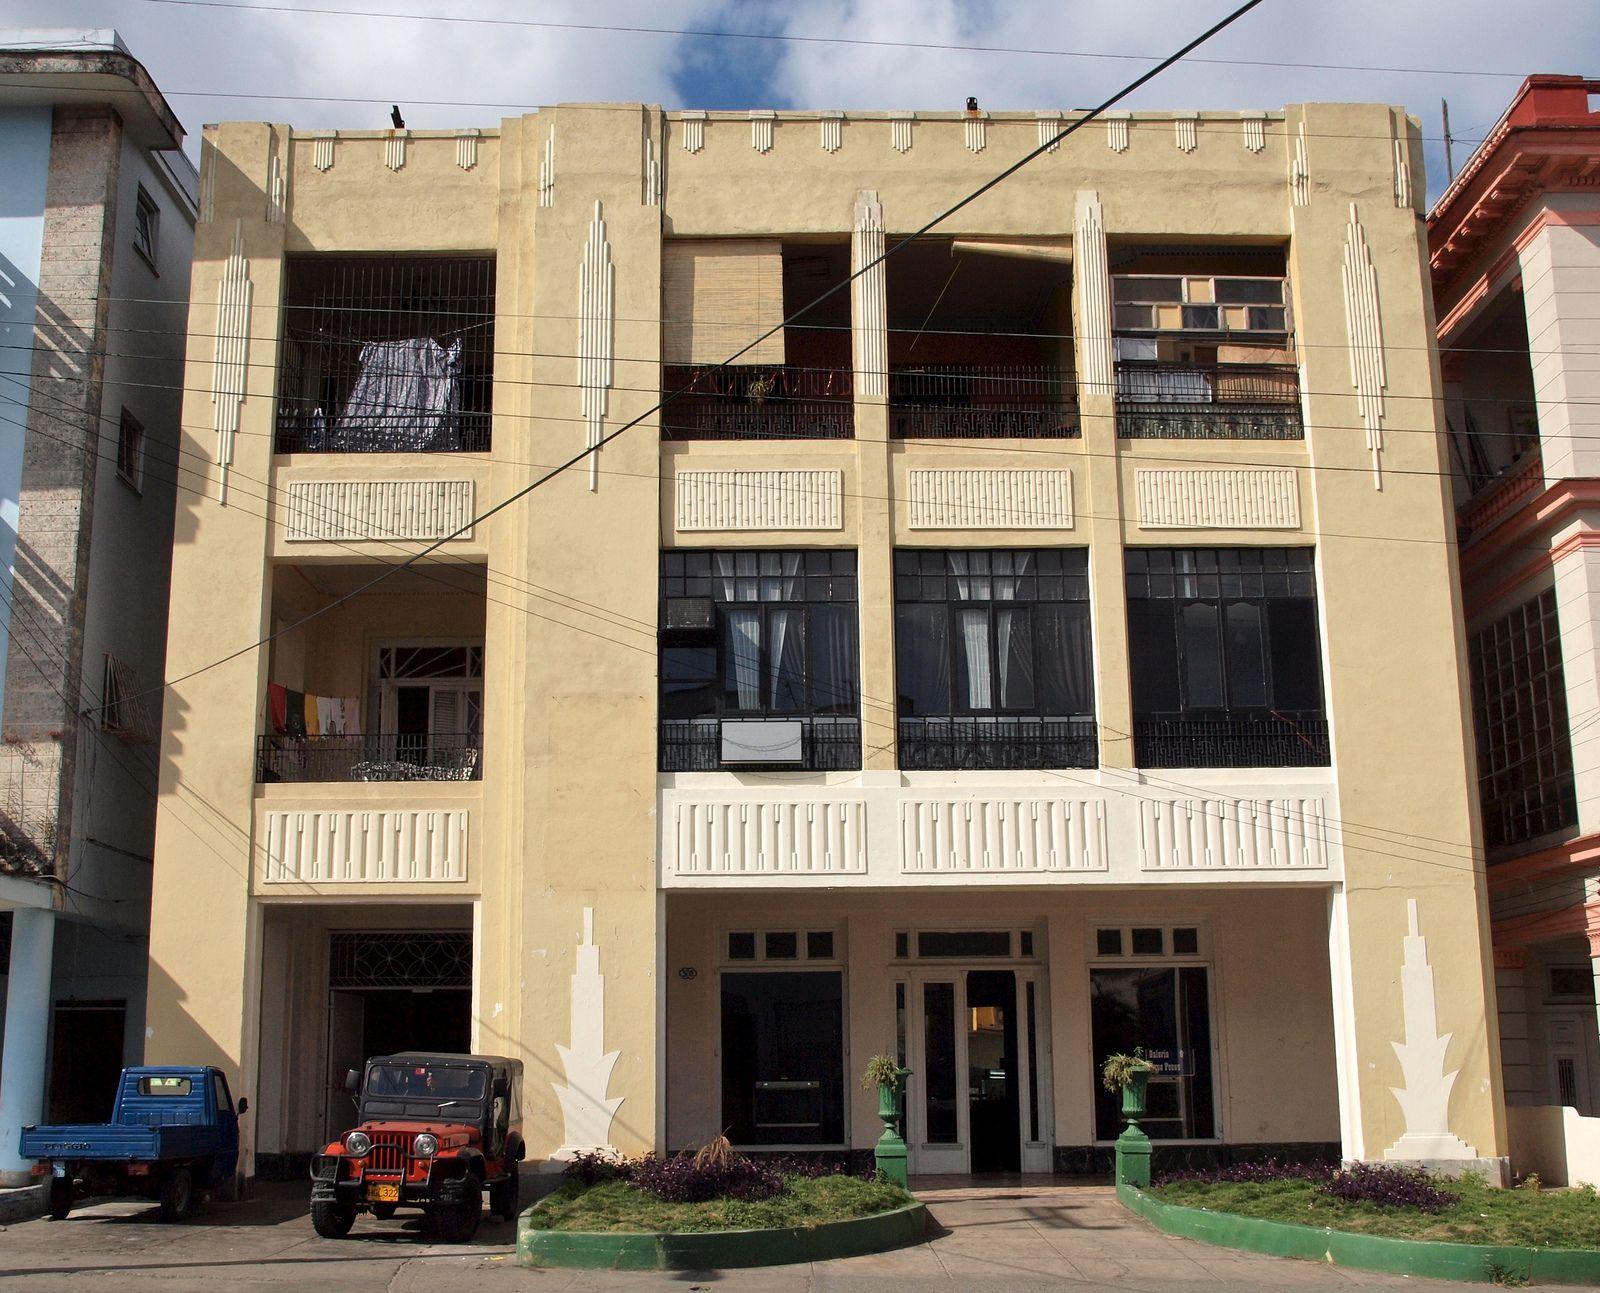 Havana Art Deco | by colros